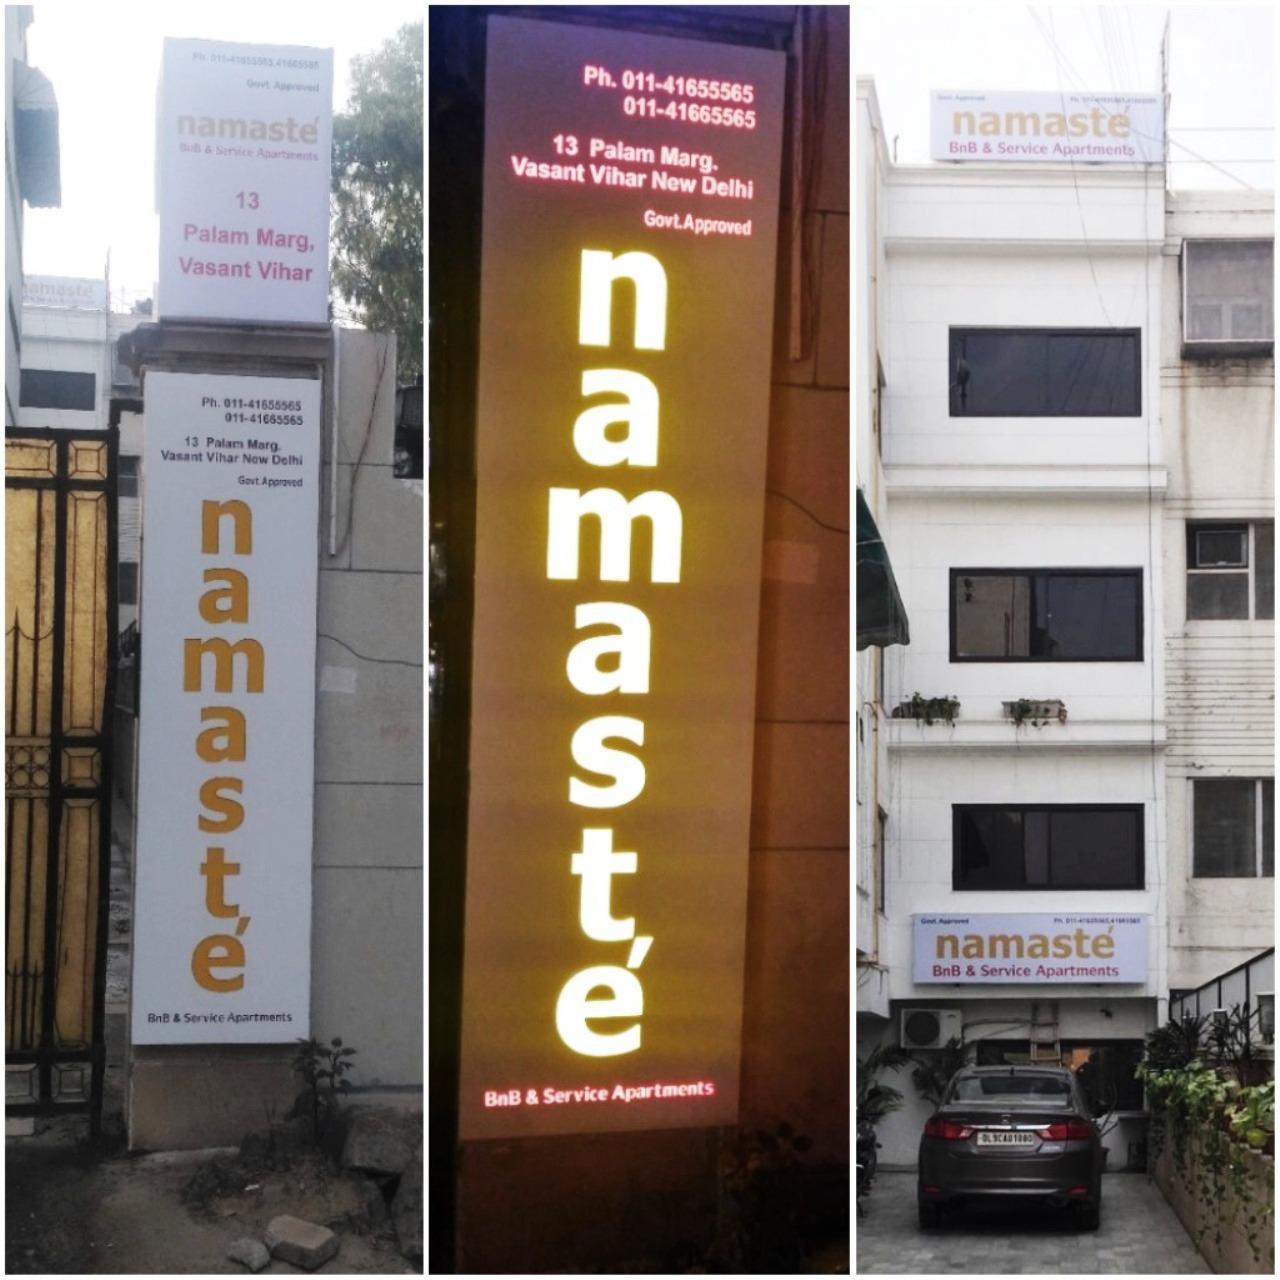 Price Namaste BnB & Service Apartments